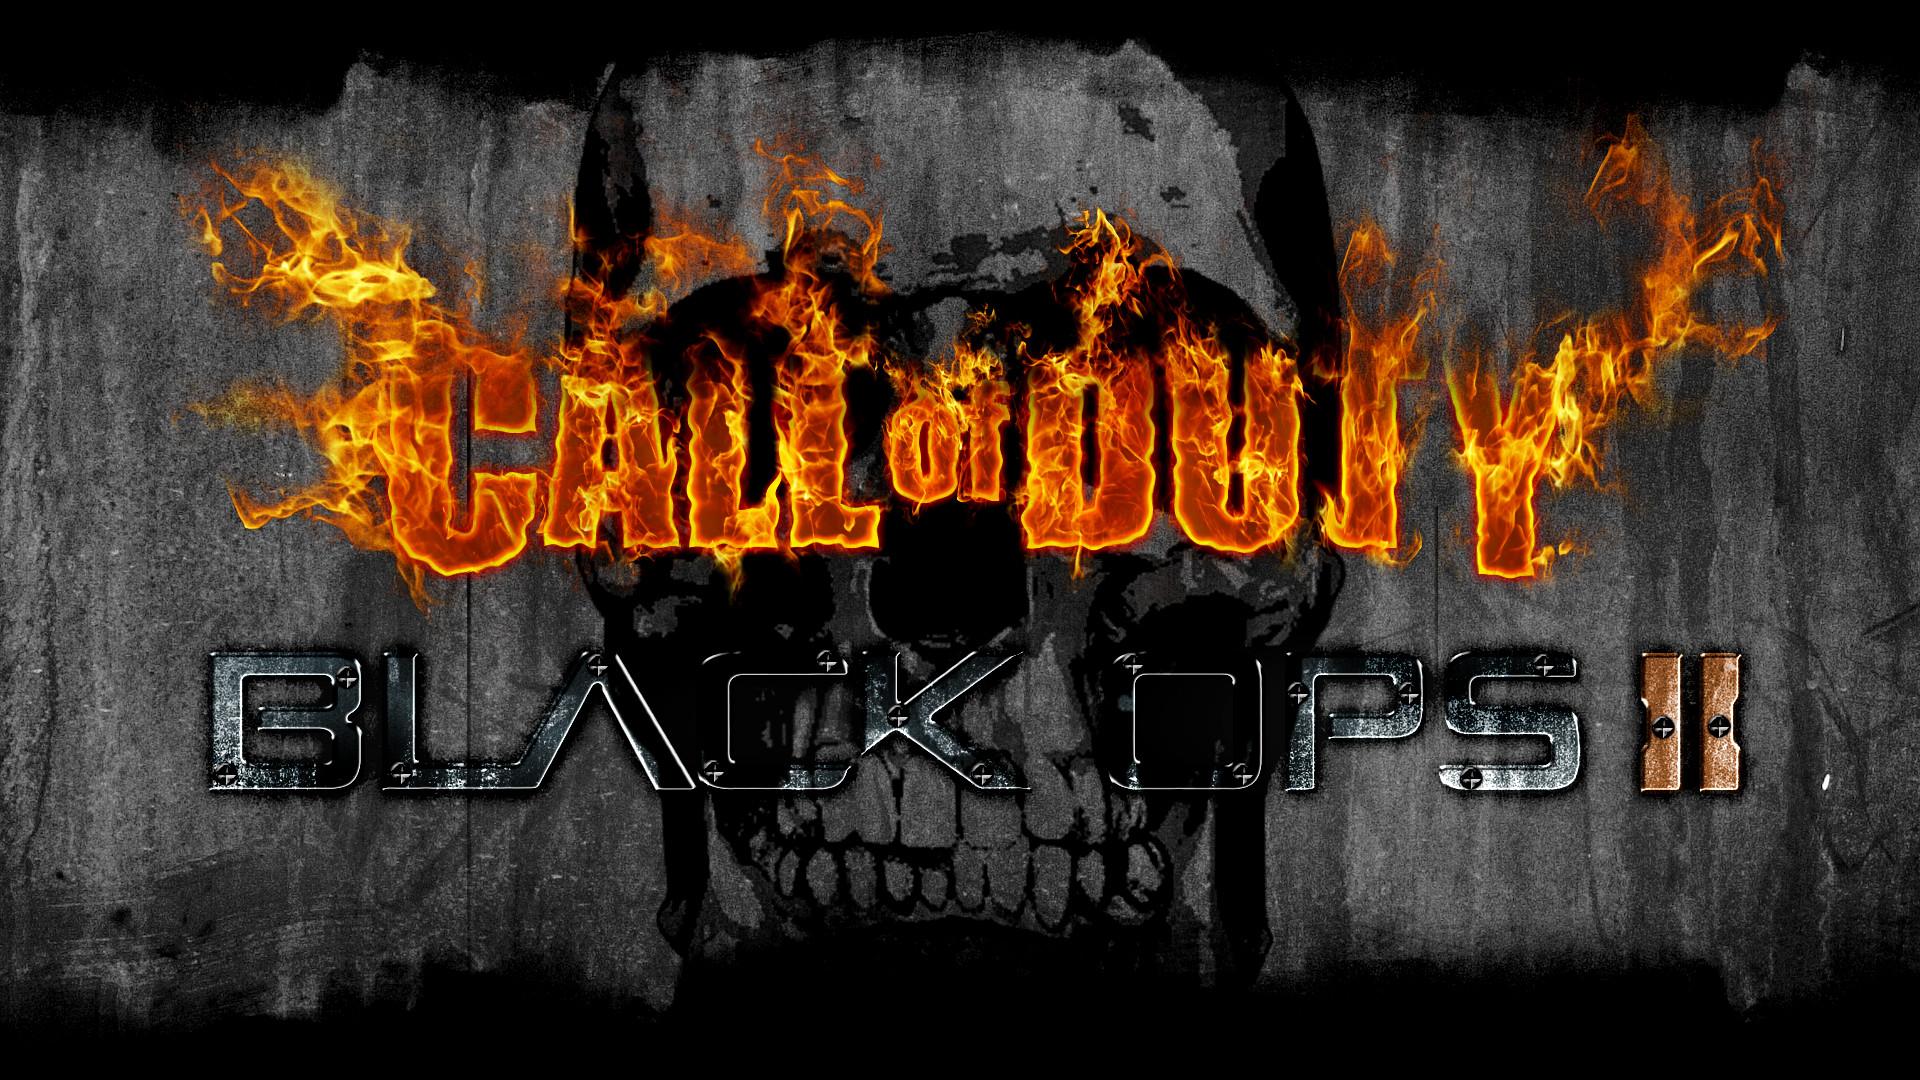 Free Black Ops 2 HD Wallpaper – Gaming News | Videos | Apparel .